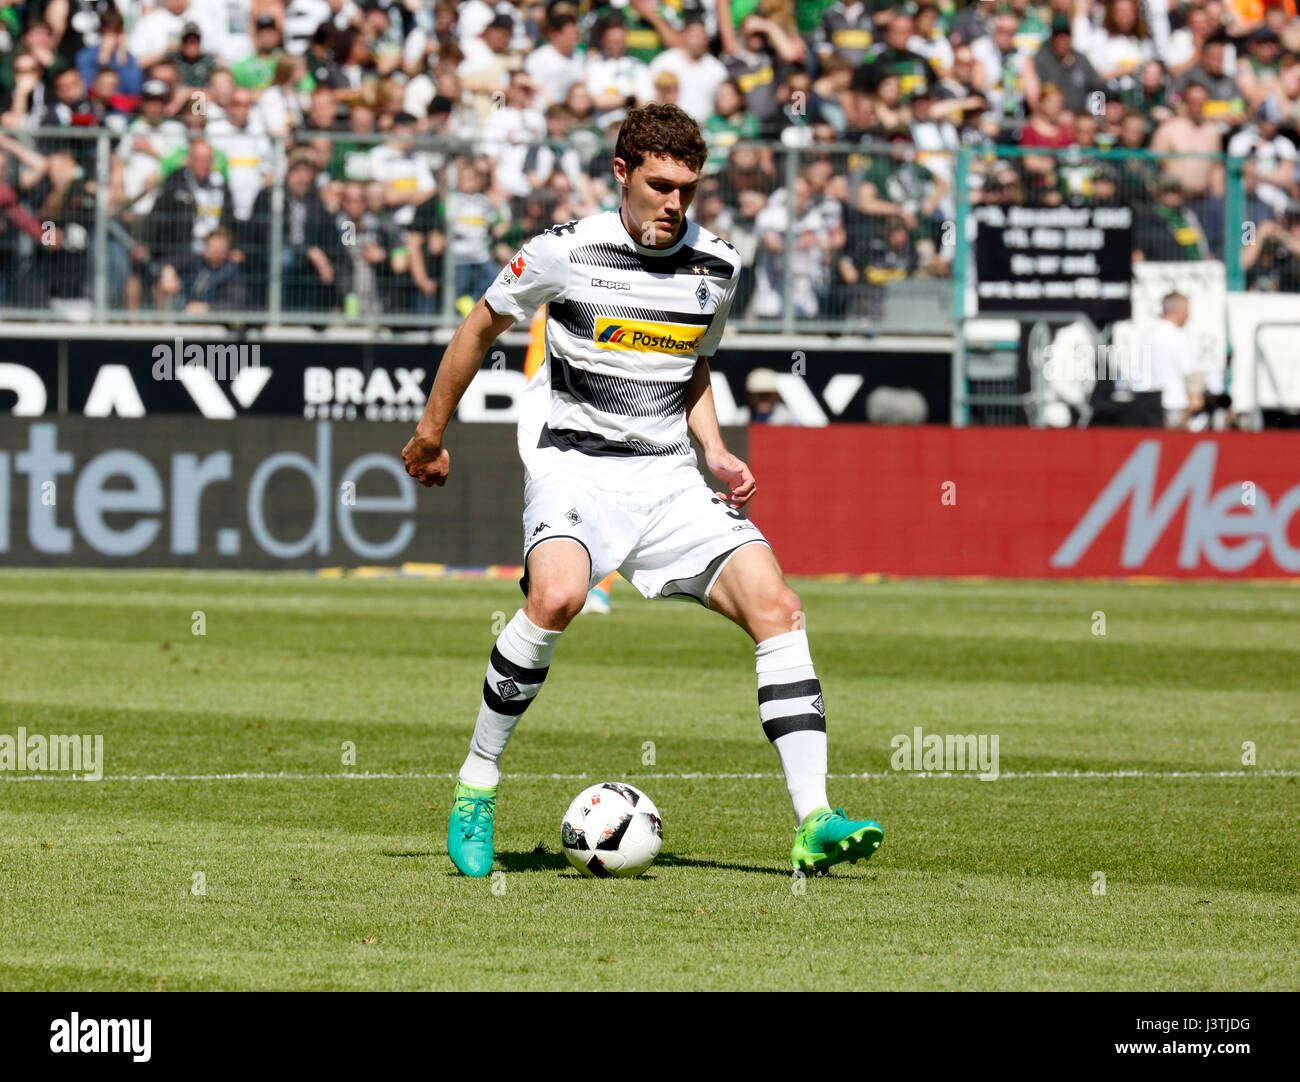 sports, football, Bundesliga, 2016/2017, Borussia Moenchengladbach vs FC Augsburg 1:1, Stadium Borussia Park, scene - Stock Image